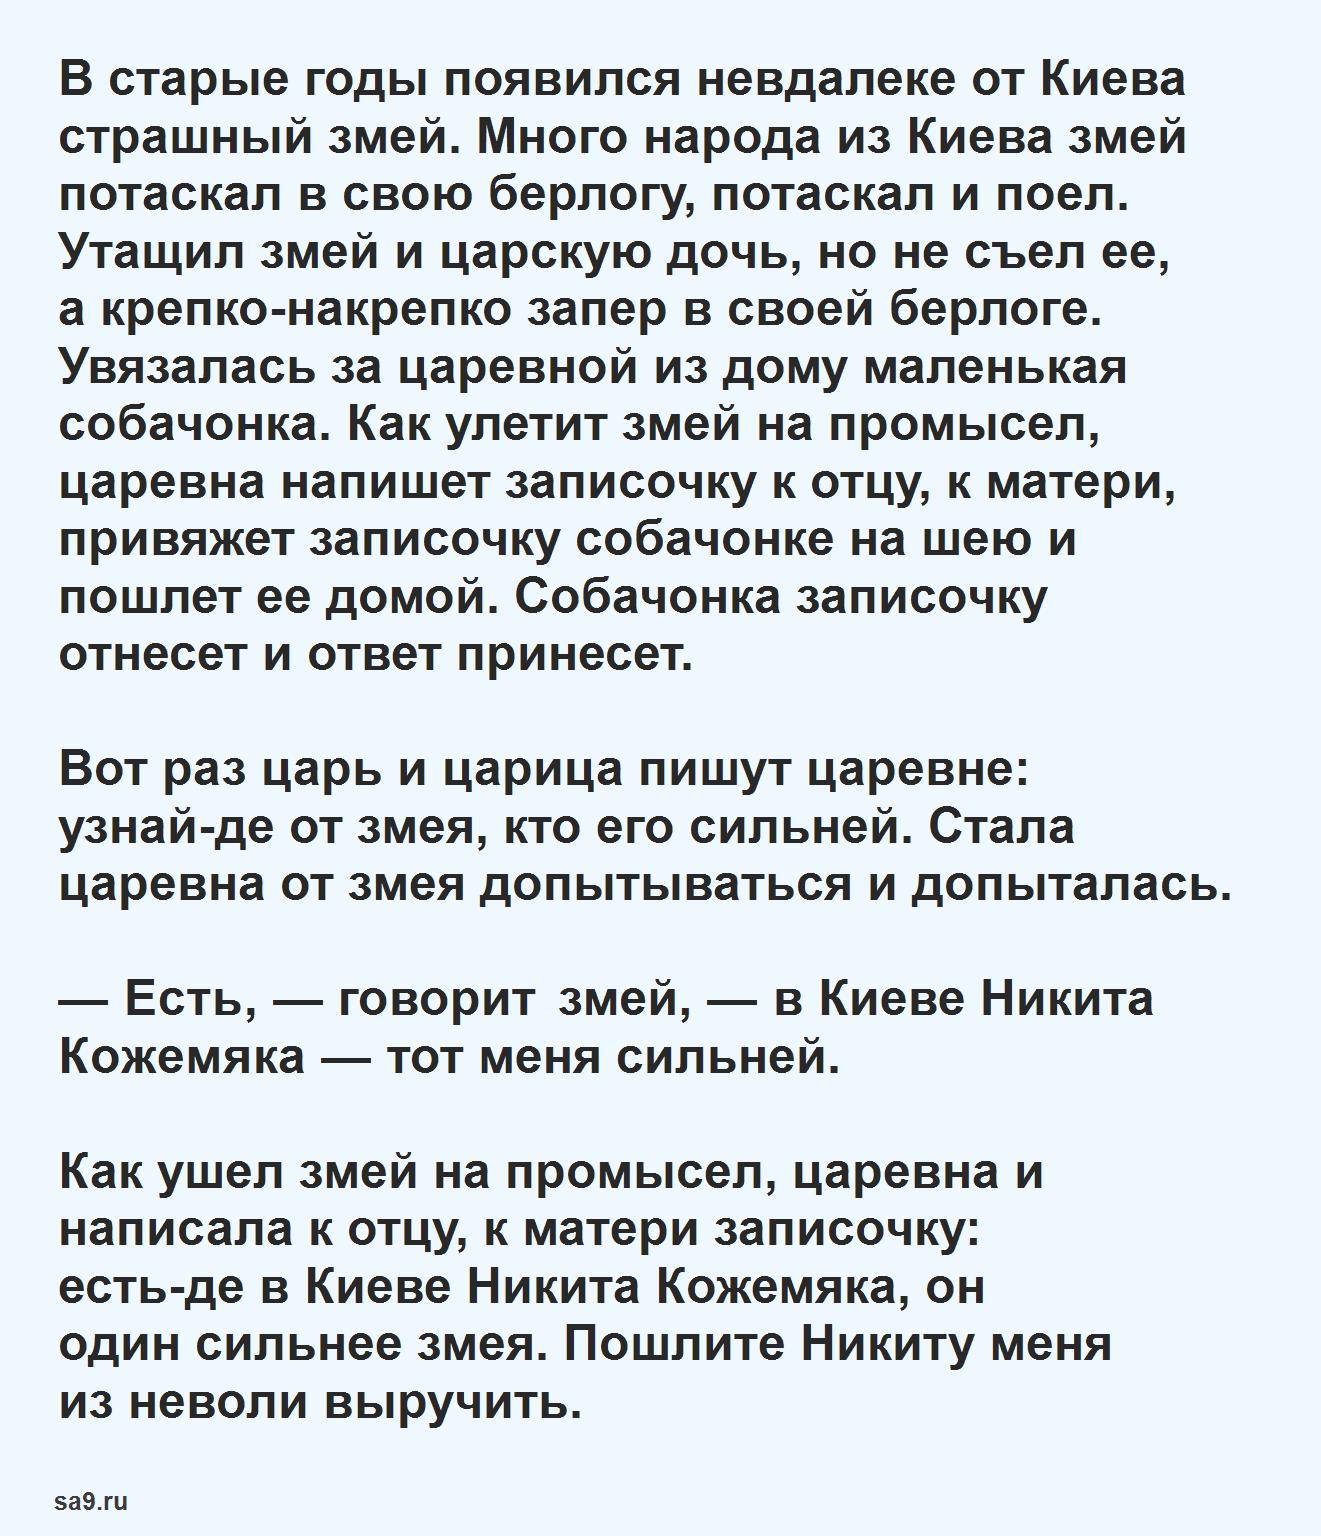 Никита Кожемяка - русская народная сказка